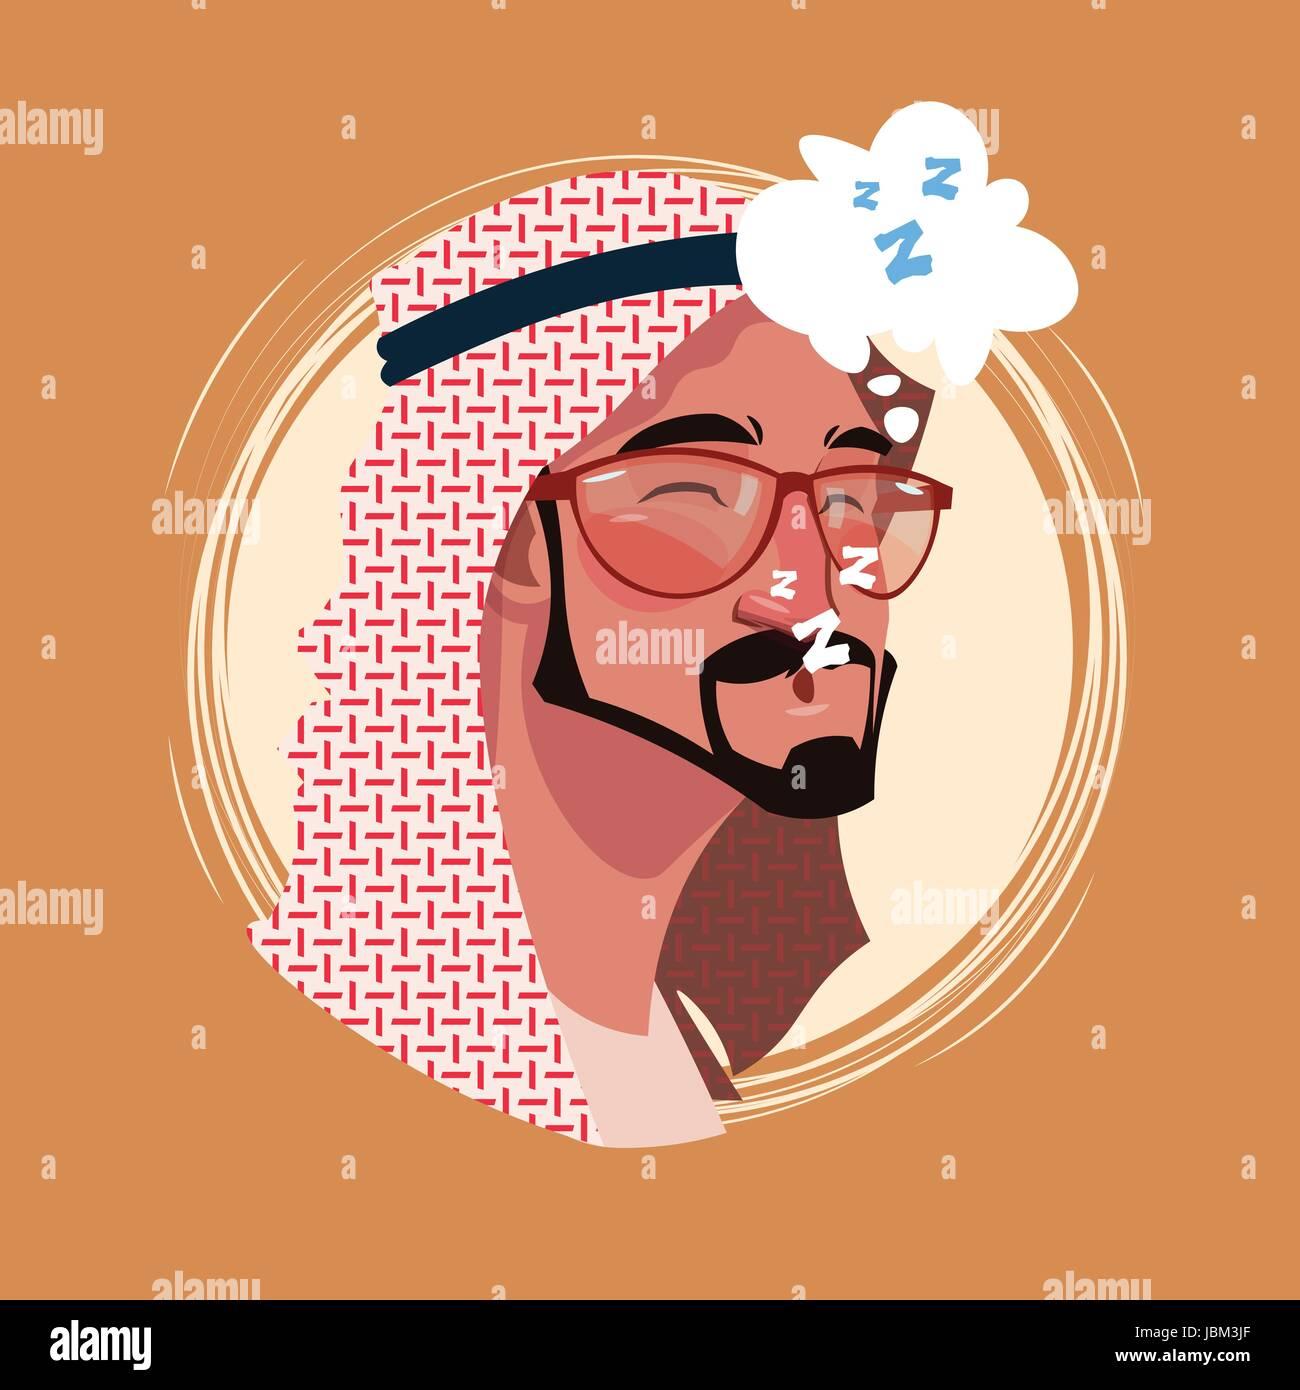 Profile Icon Indian Male Emotion Avatar, Man Cartoon